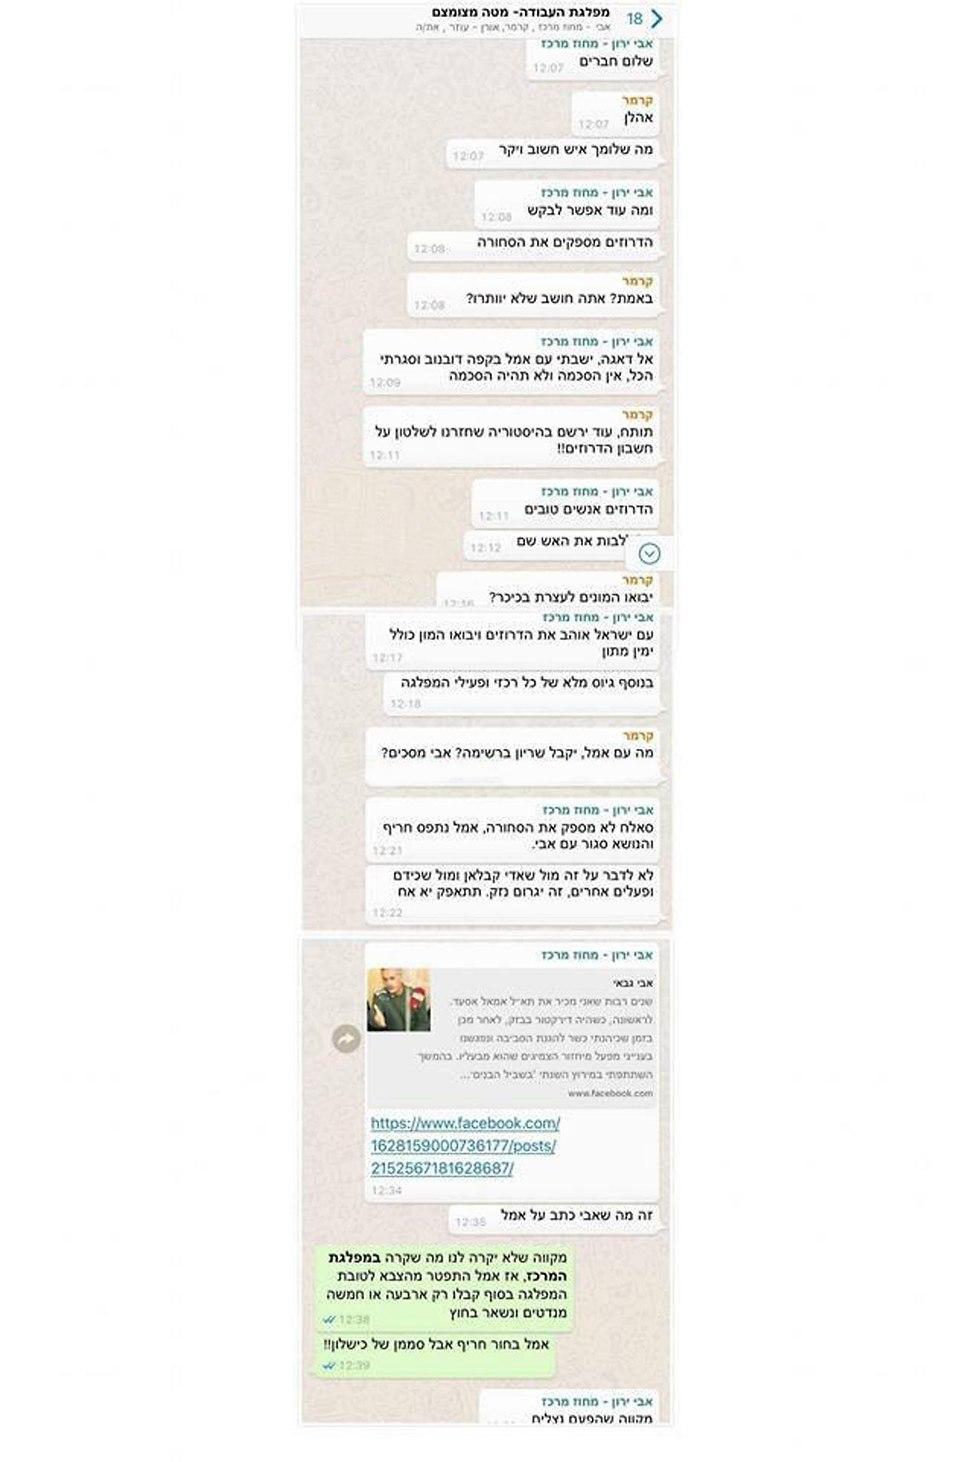 The fake WhatsApp chat